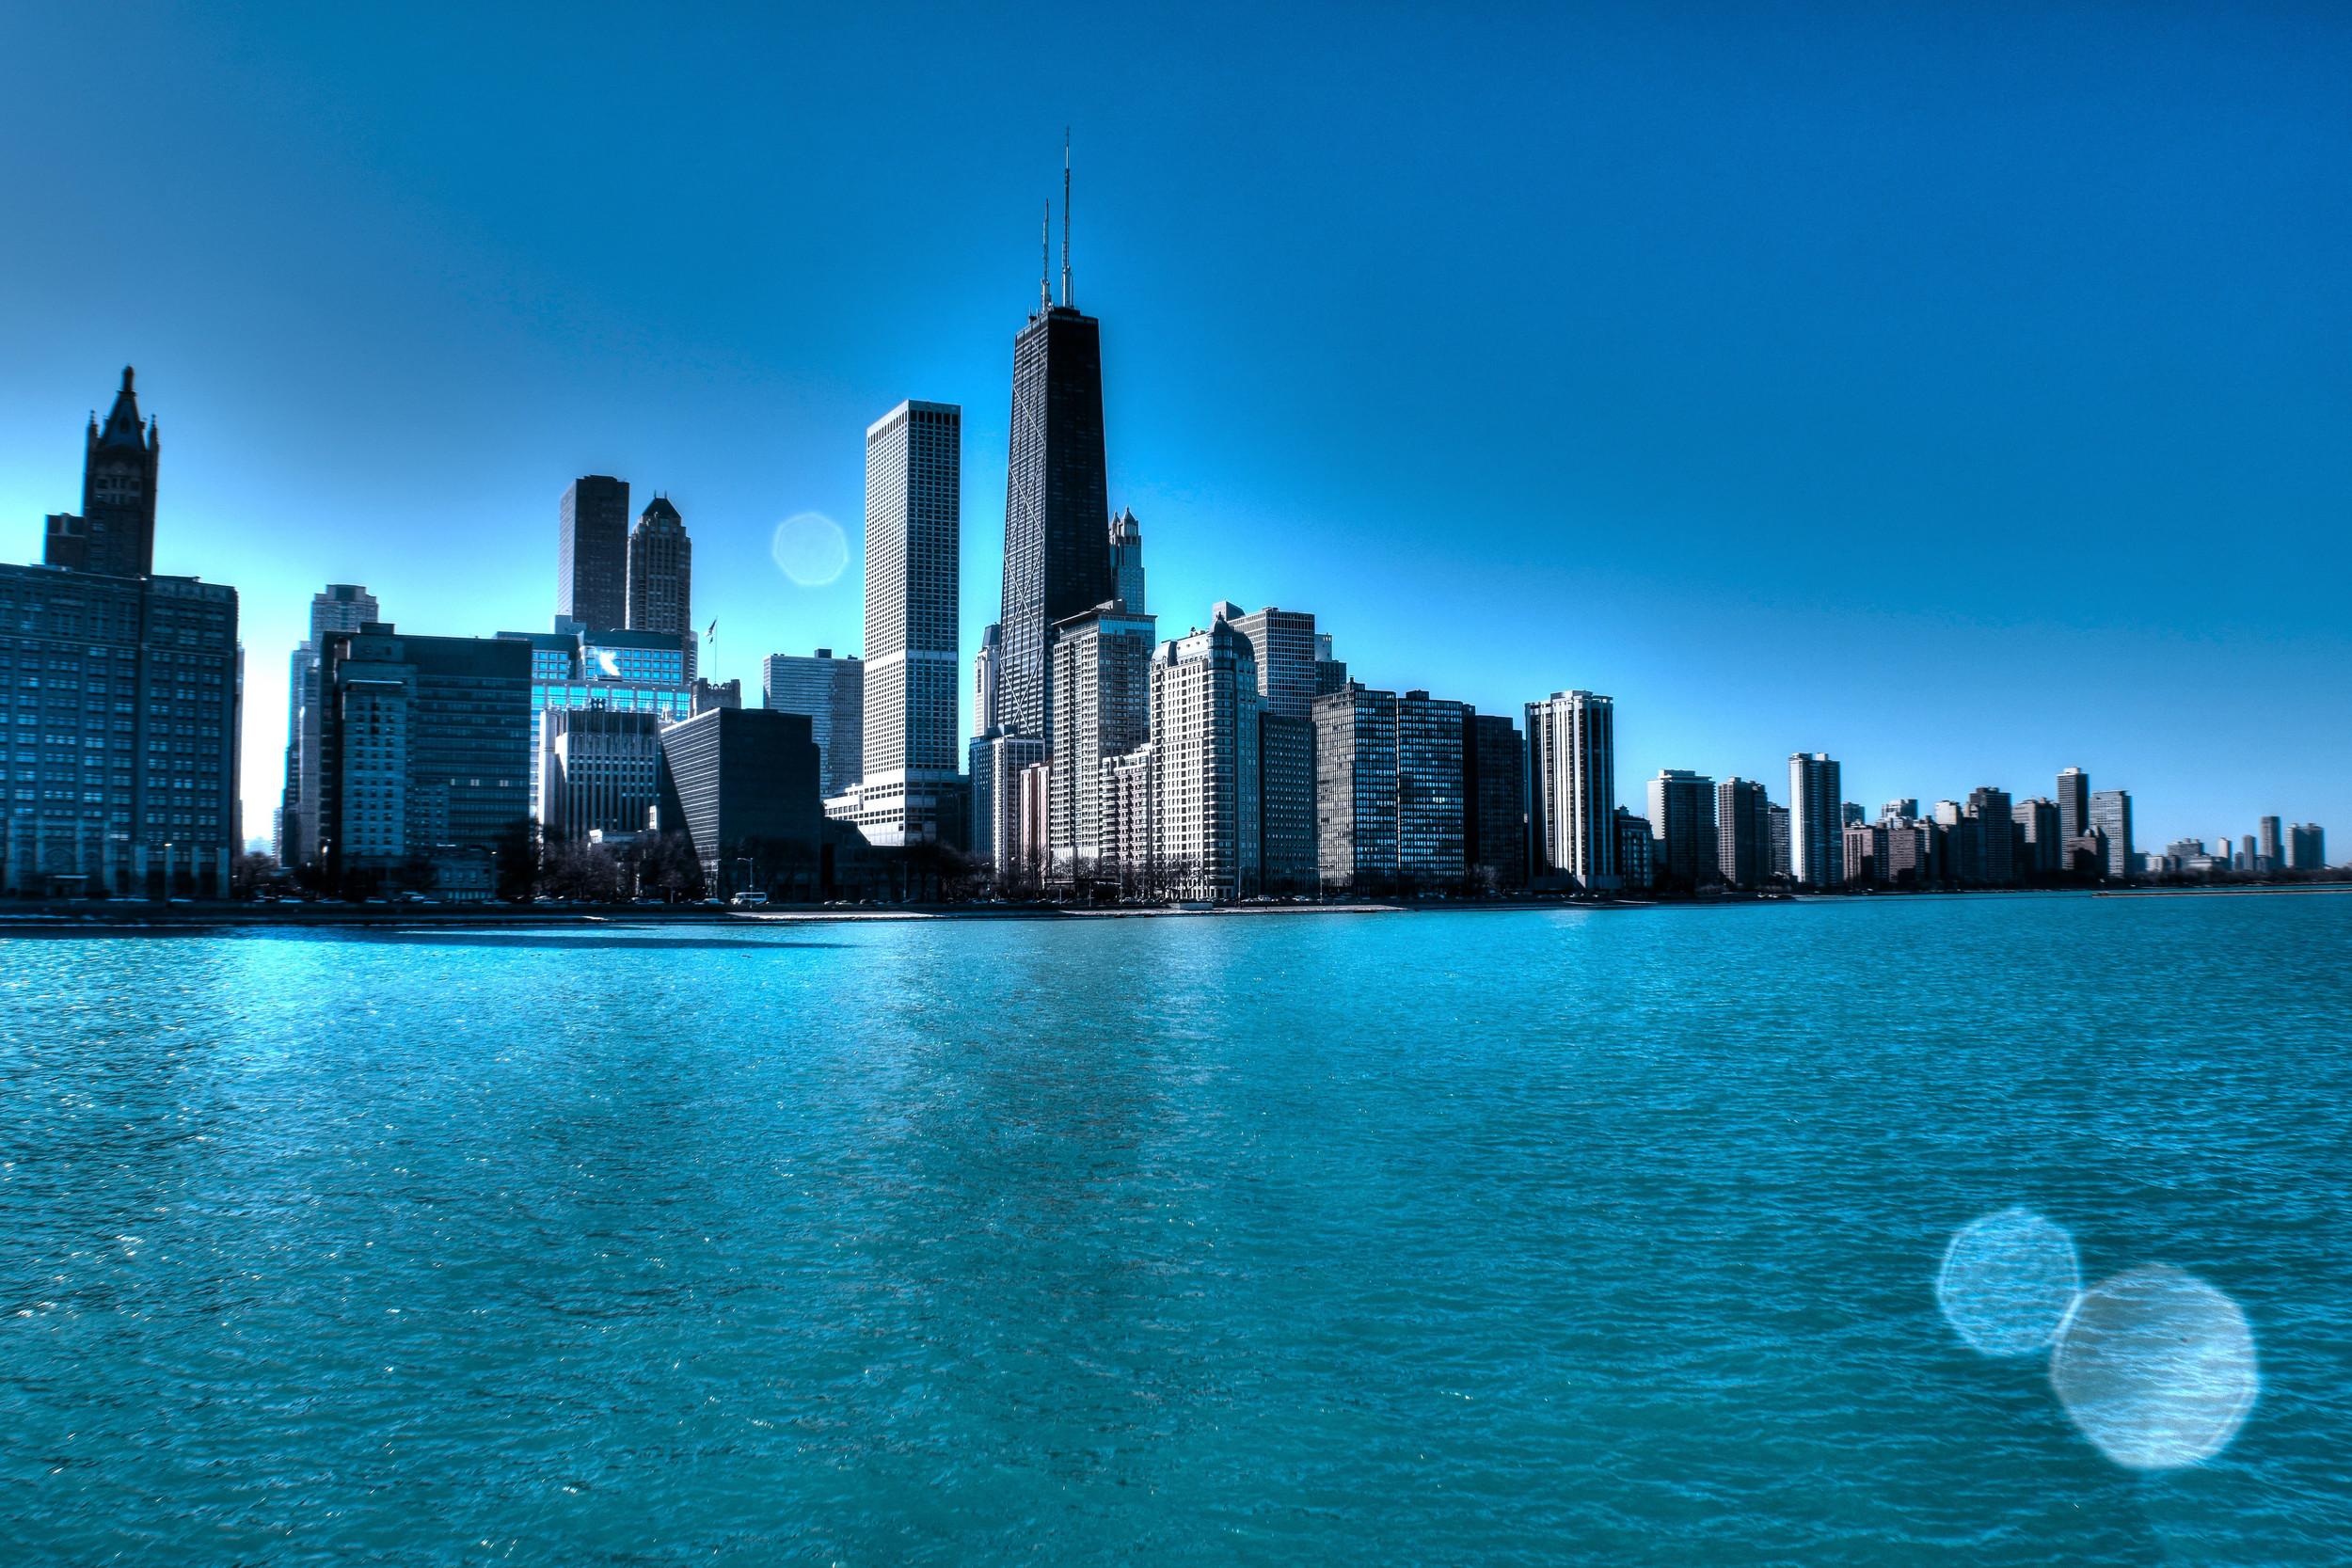 The possibilities of urbanity